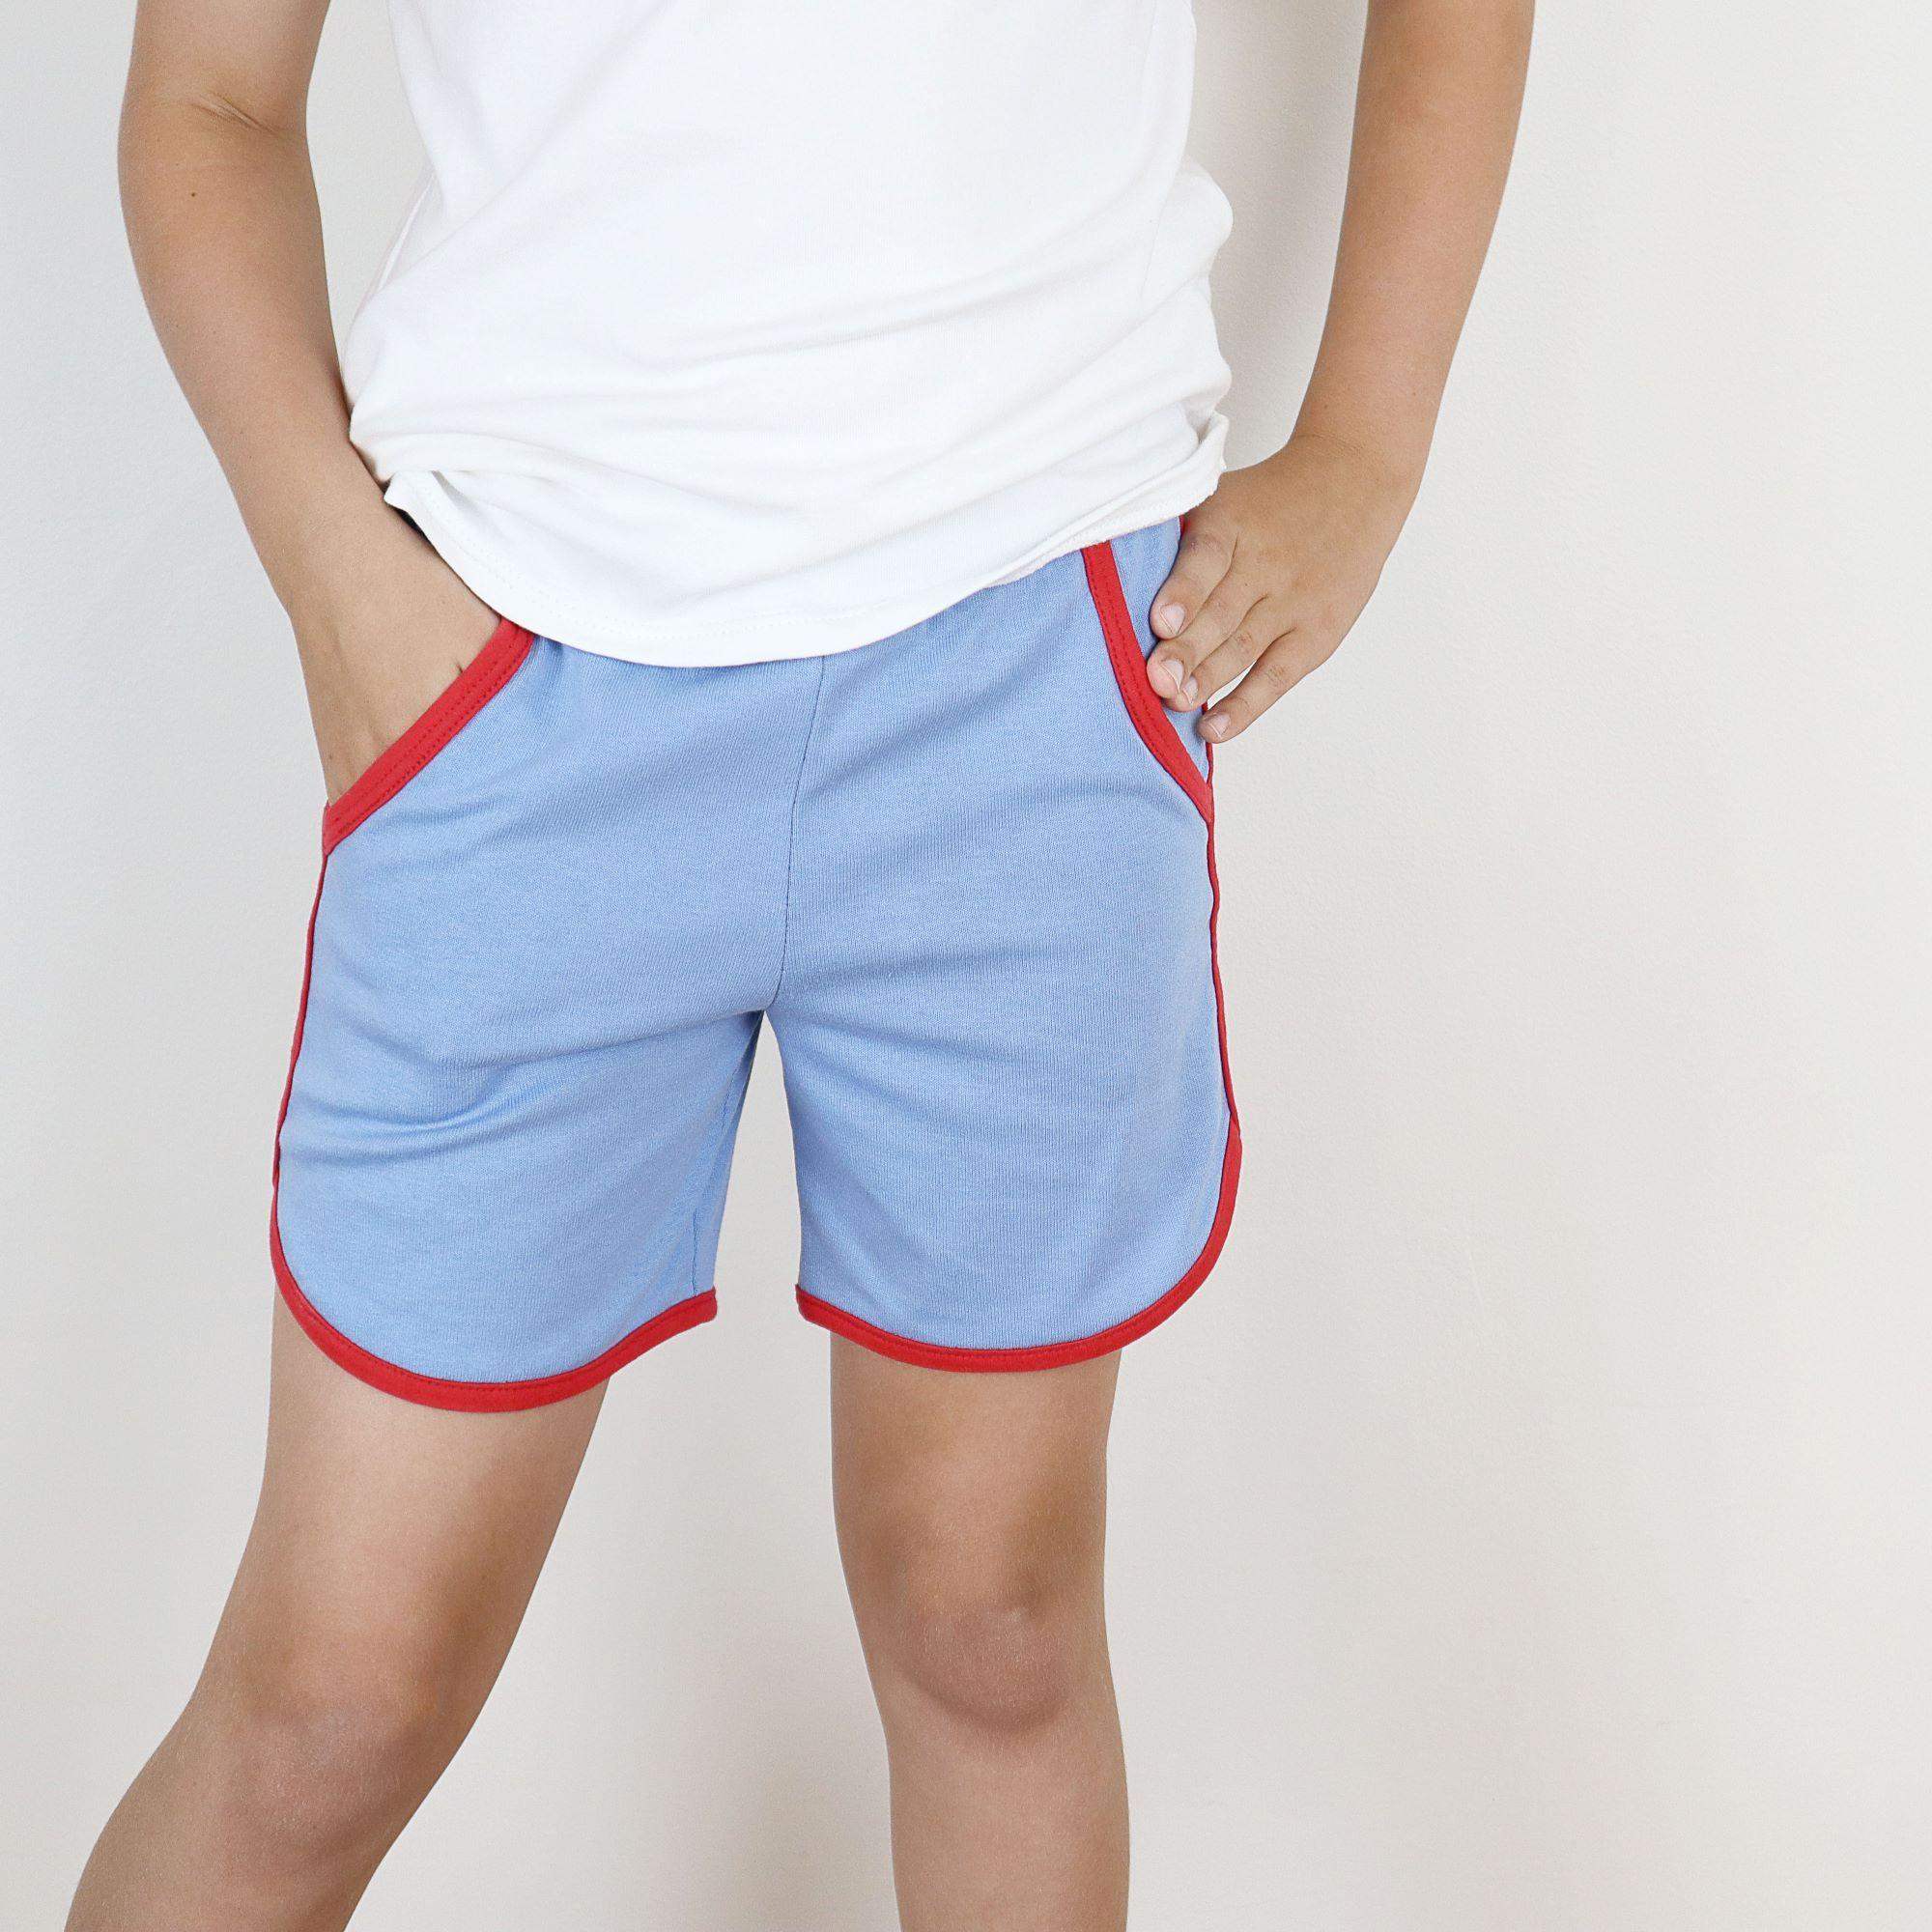 Skirt thong blowjob